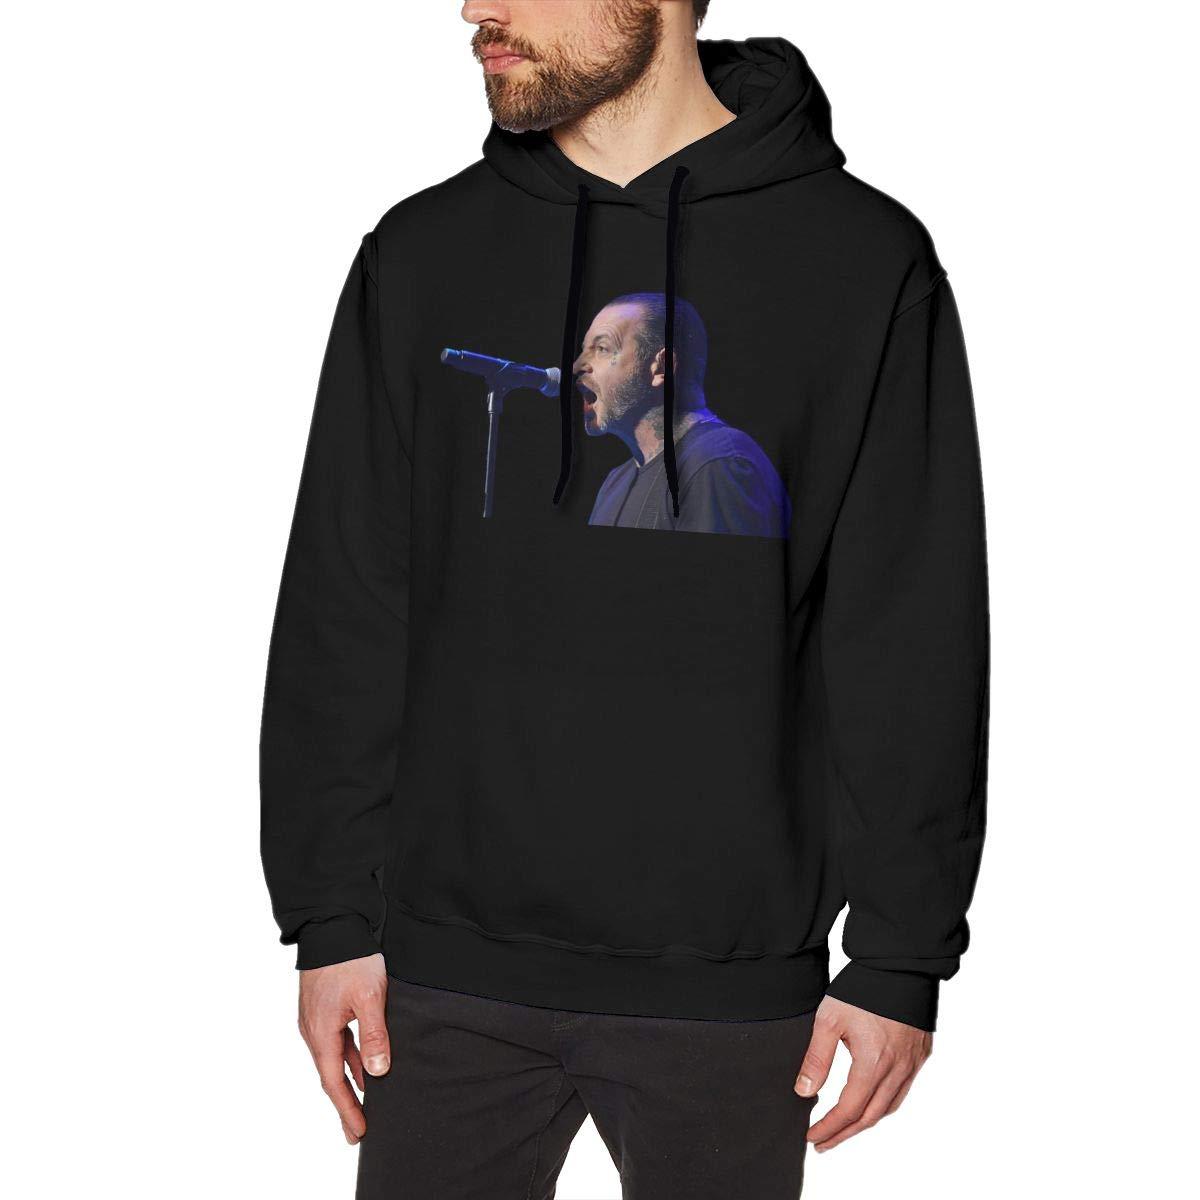 Aifreedom1 Social Distortion Soft Men's Hoodie Sweatshirt Black